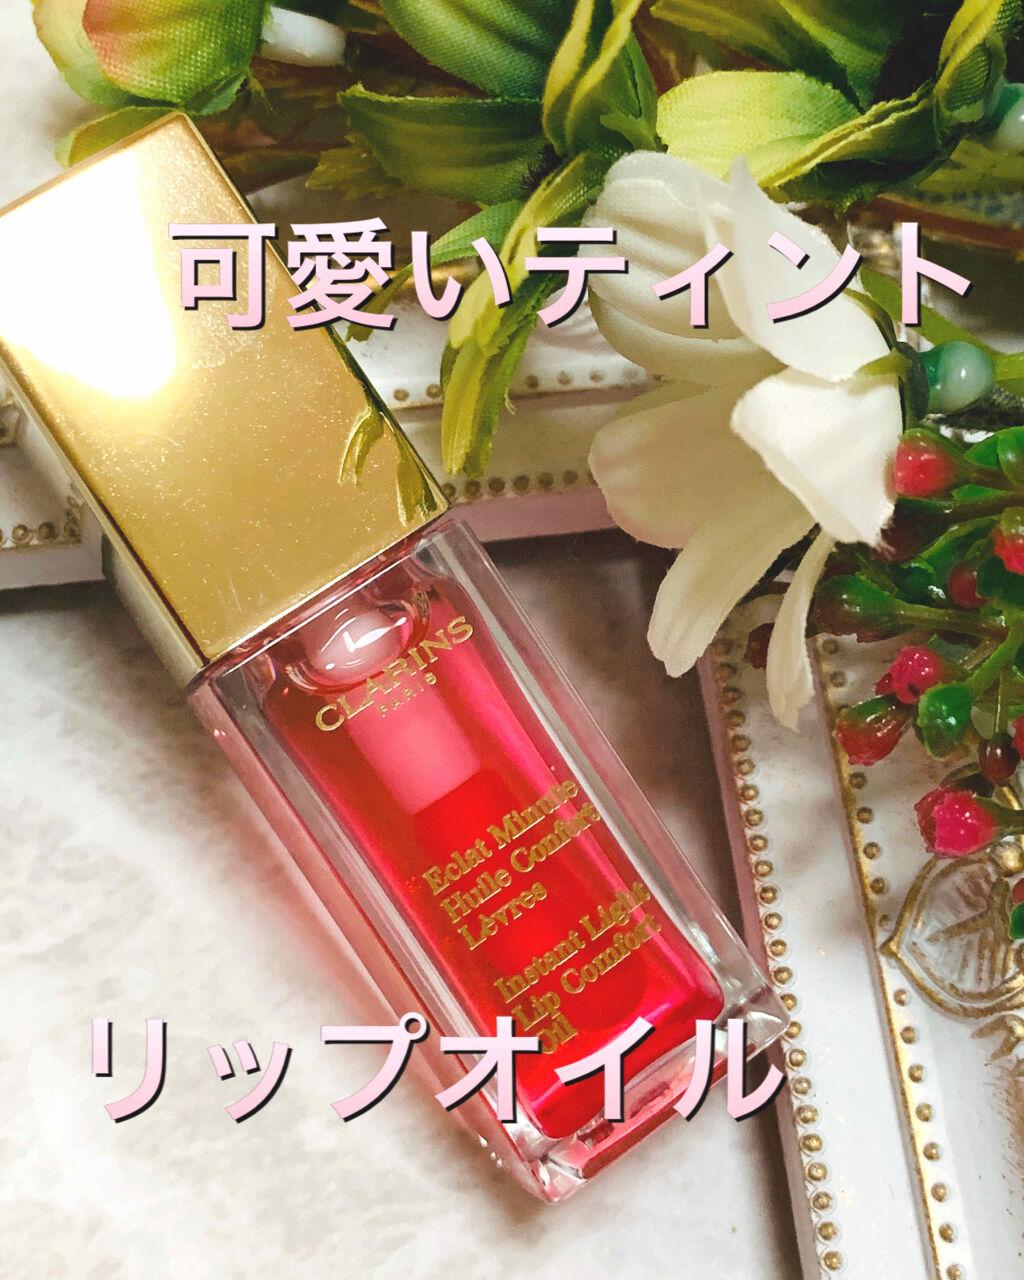 https://cdn.lipscosme.com/image/23174d6eb2af6b9bee9016ed-1587729915-thumb.png